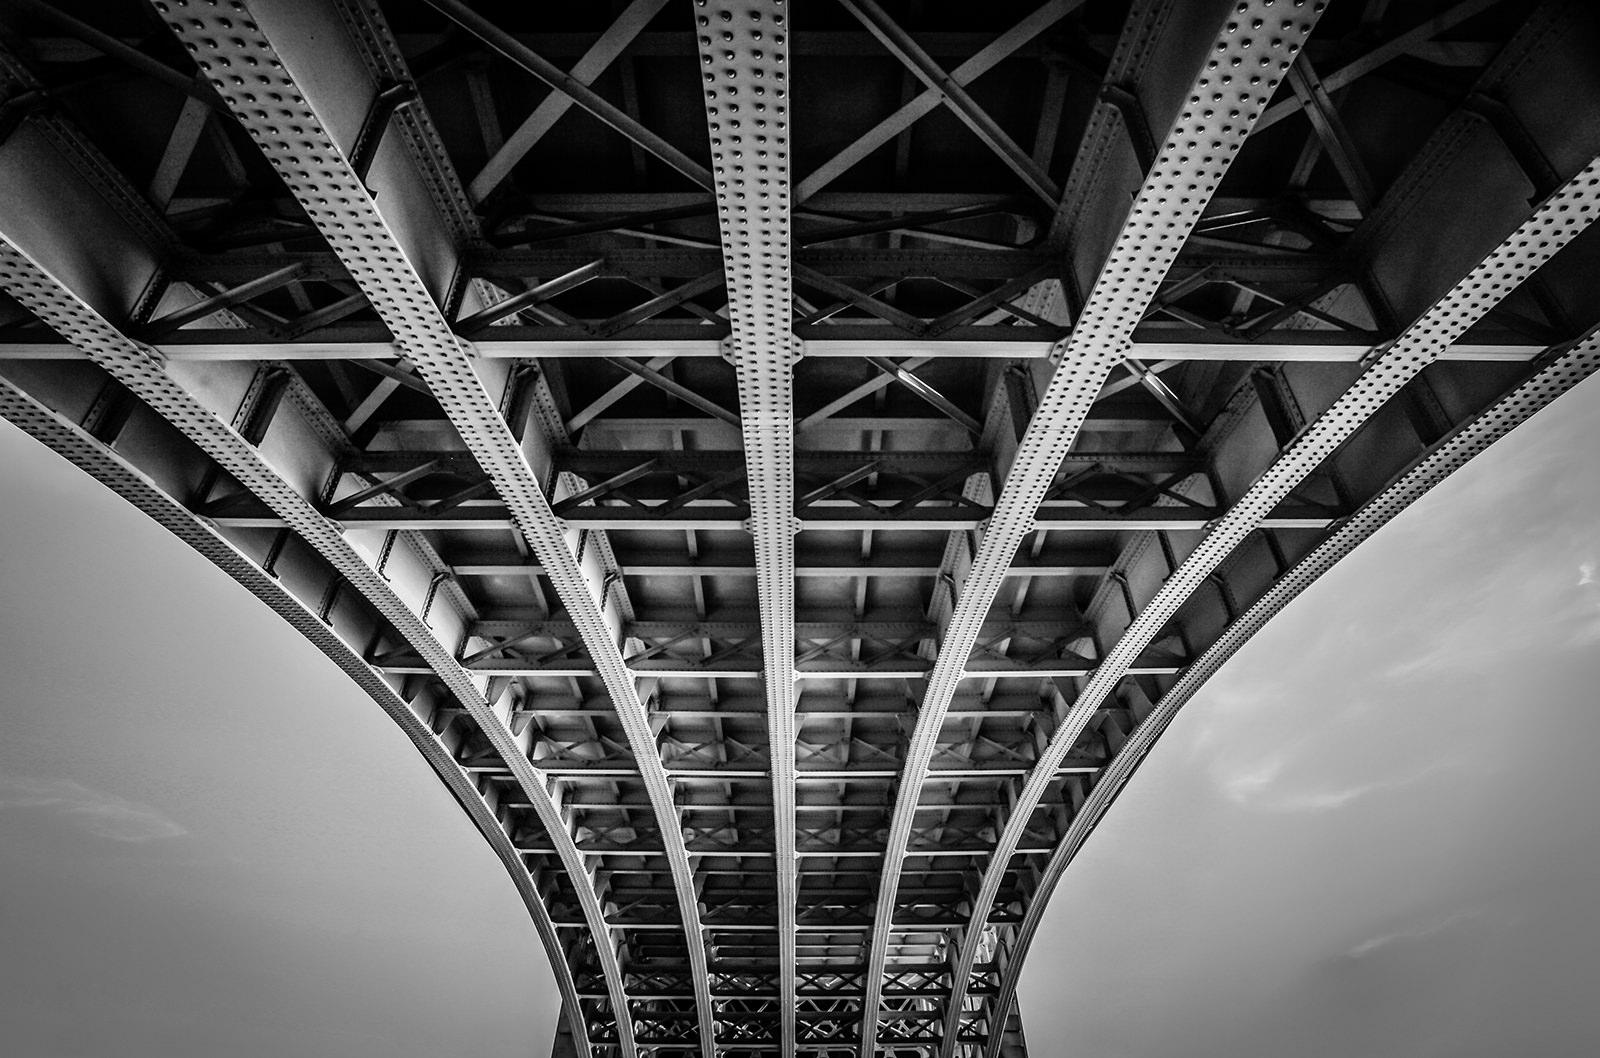 Steel construction of the Blackfrairs bridge in London